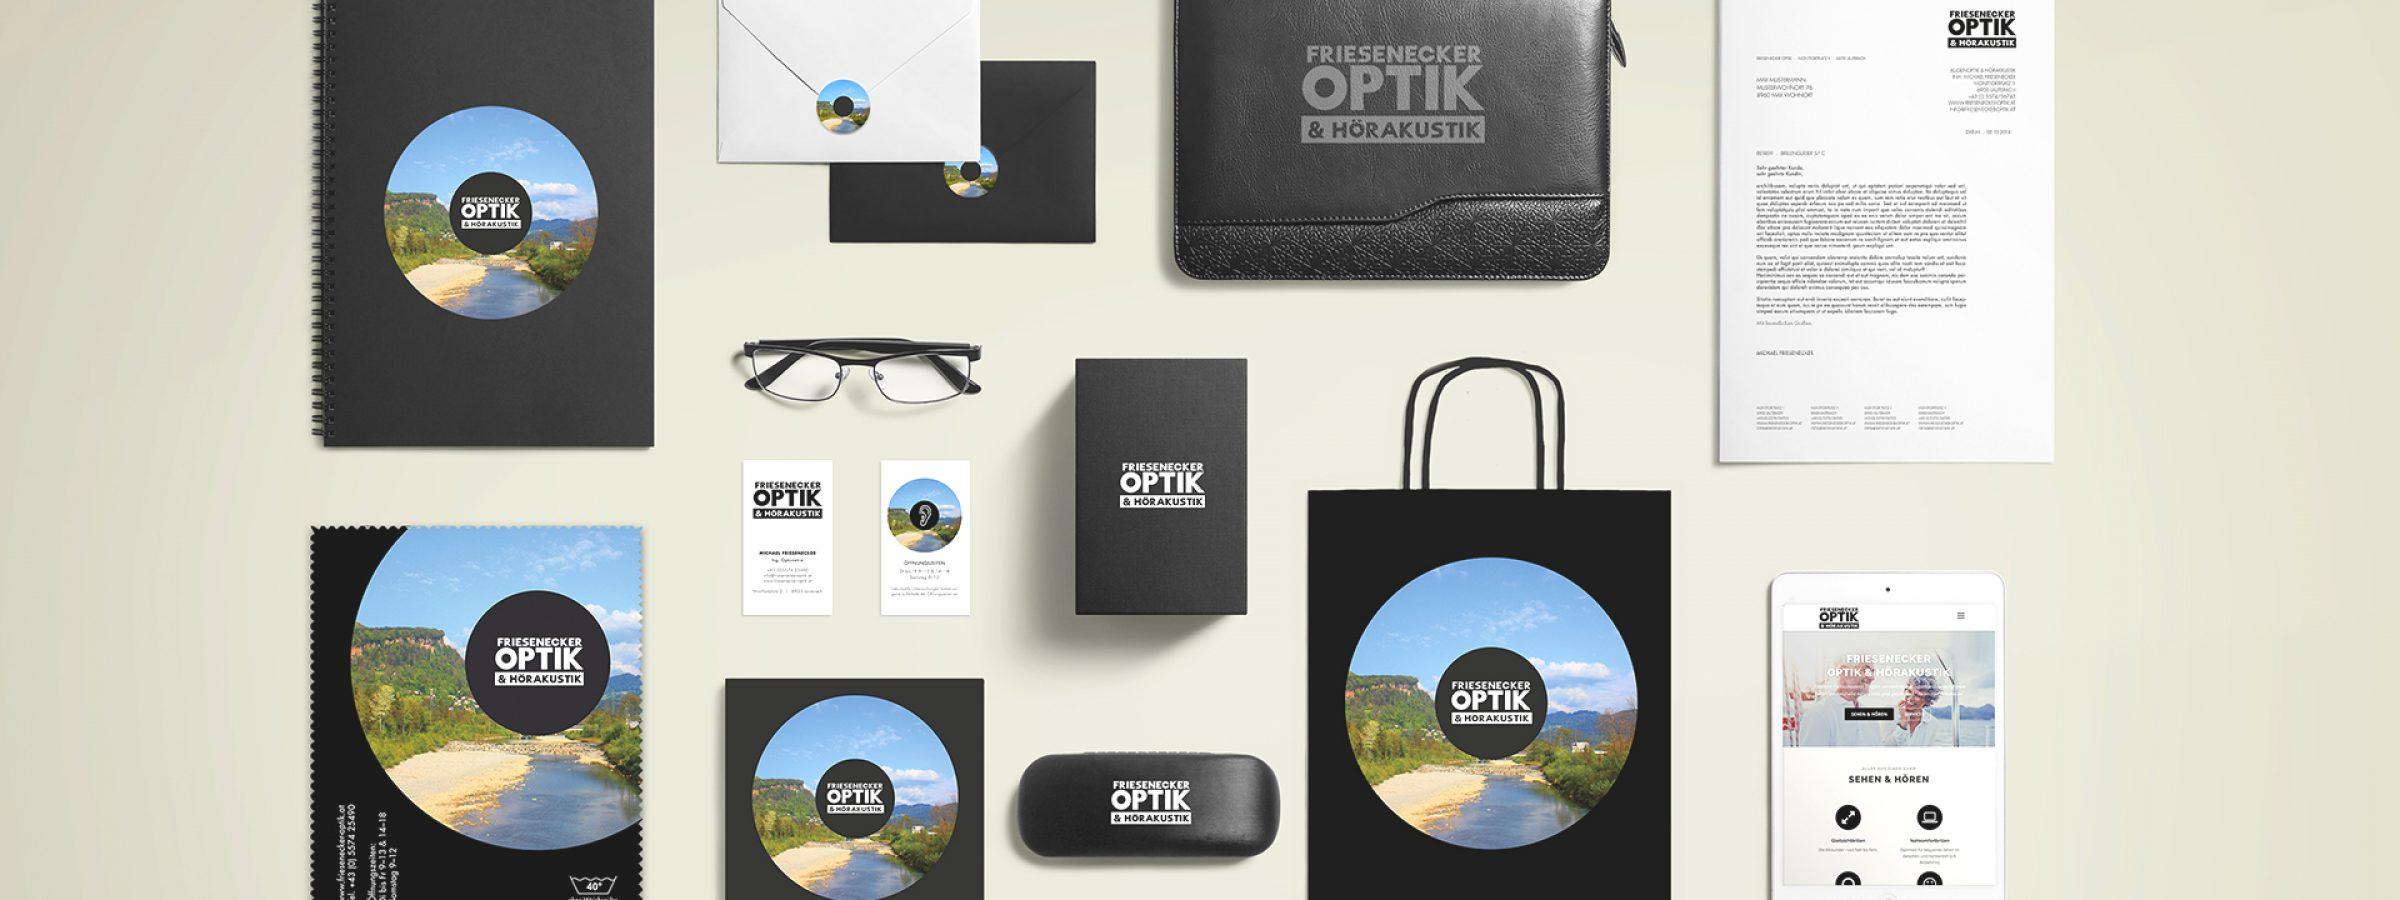 rock-the-public-friesenecker-optik-corporate-design